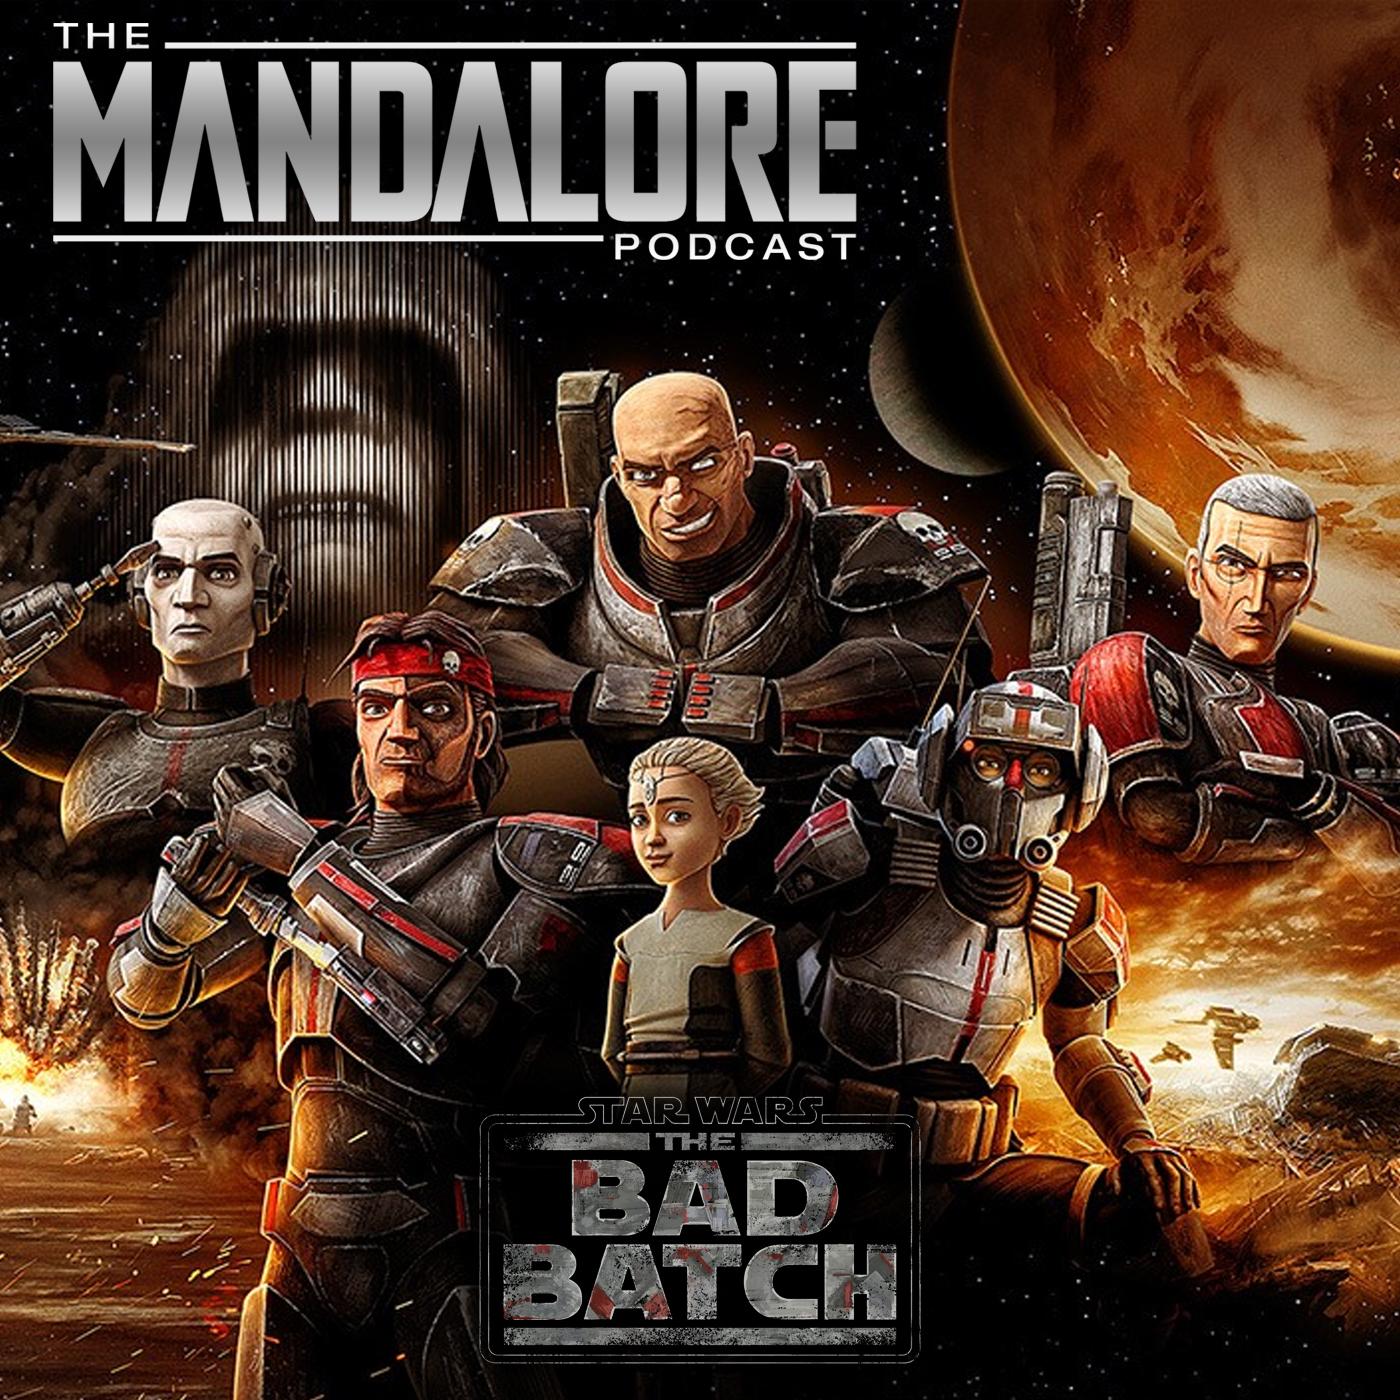 The Bad Batch - S1E10 - Common Ground